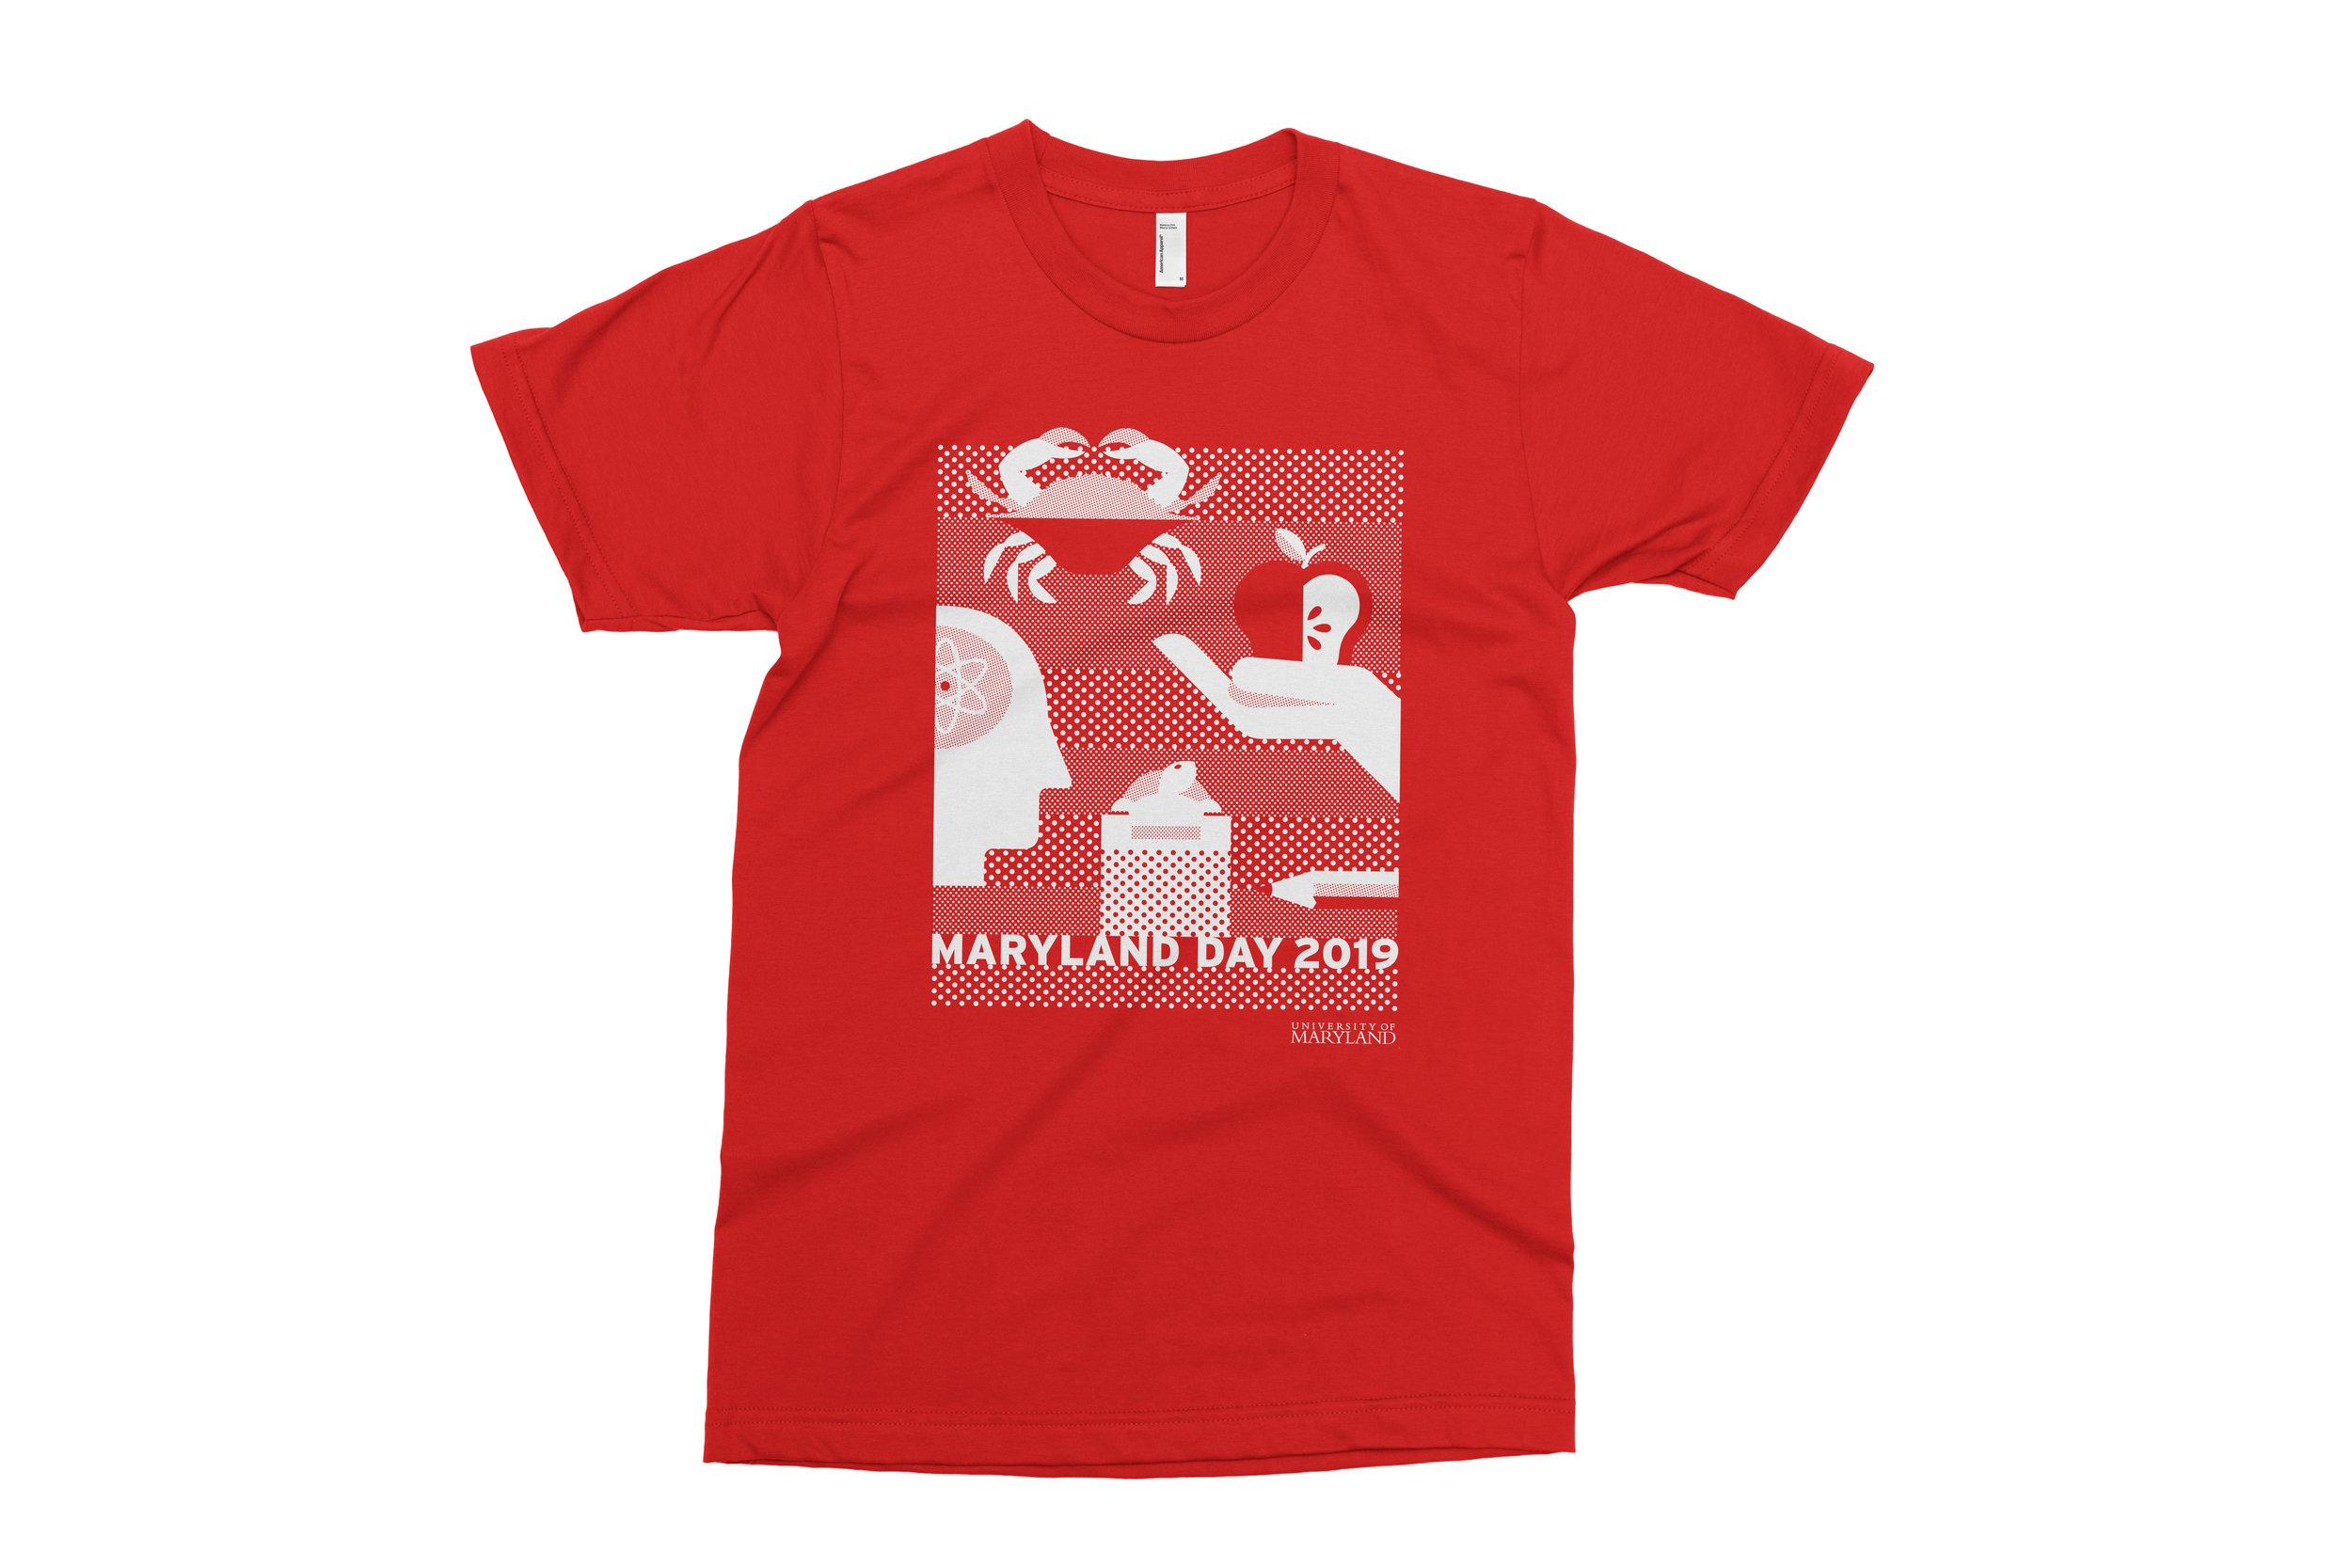 MarylandDay_Tshirt_Red.jpg